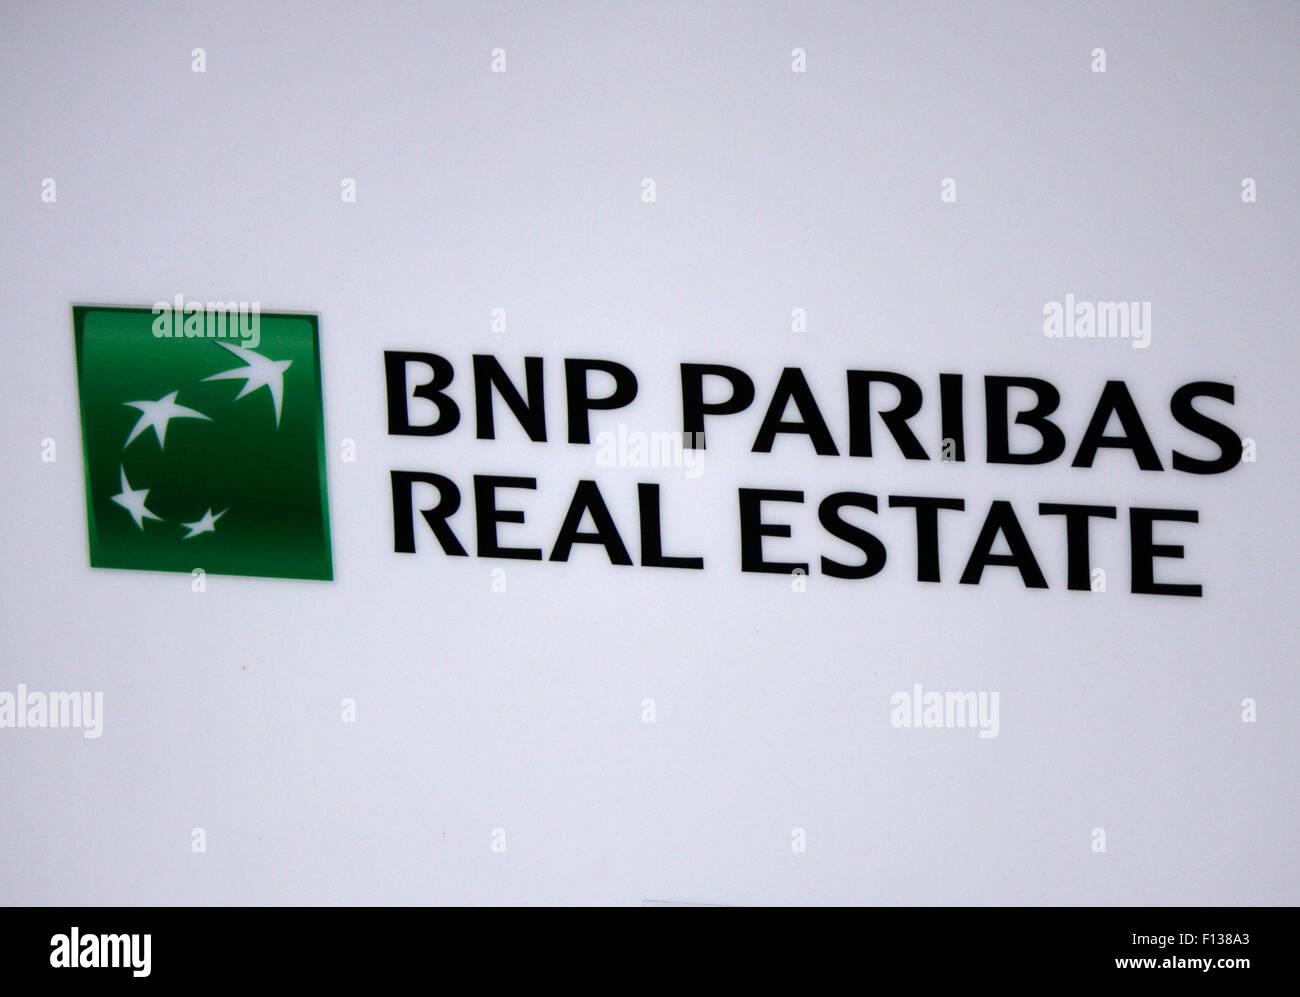 Markennamen: 'BNP Paribas Real Estate', Frankfurt am Main. - Stock Image